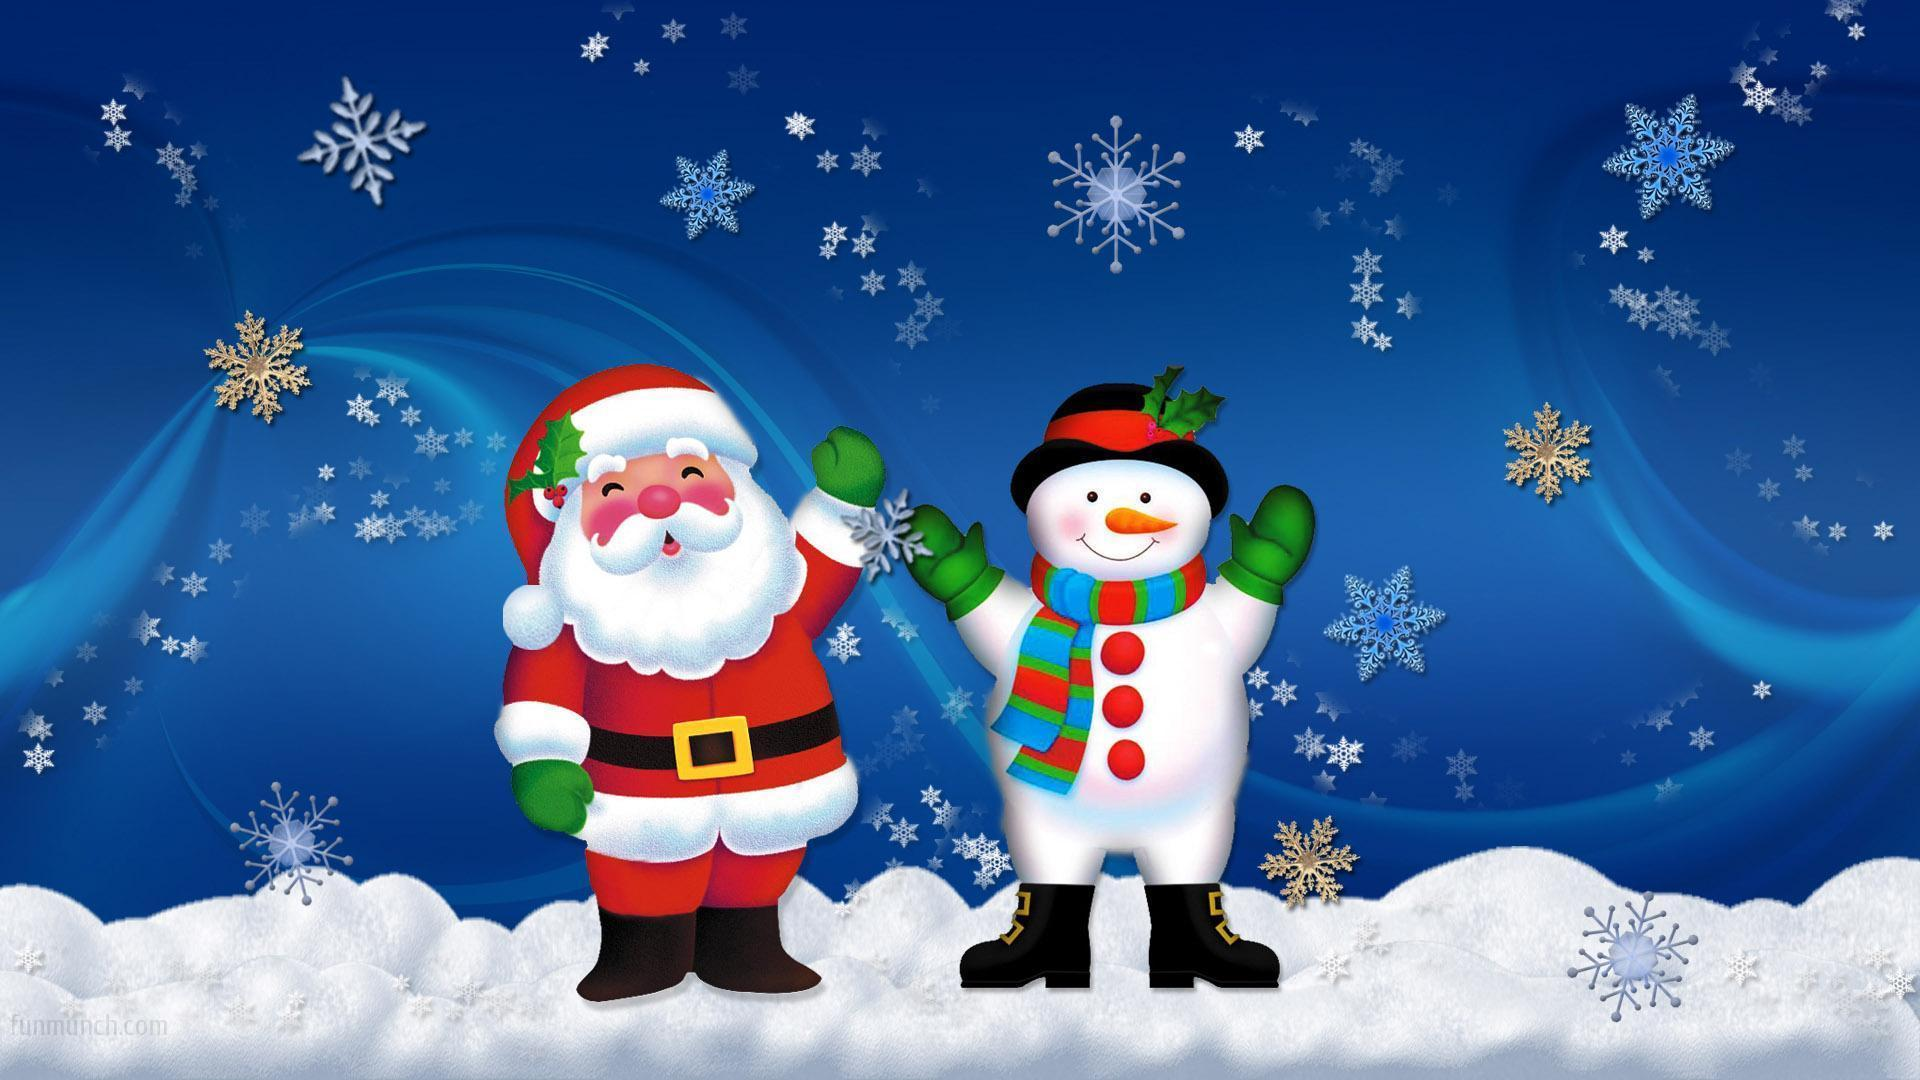 Wallpaper iphone natal - Xmas Stuff For Cute Christmas Wallpaper Iphone